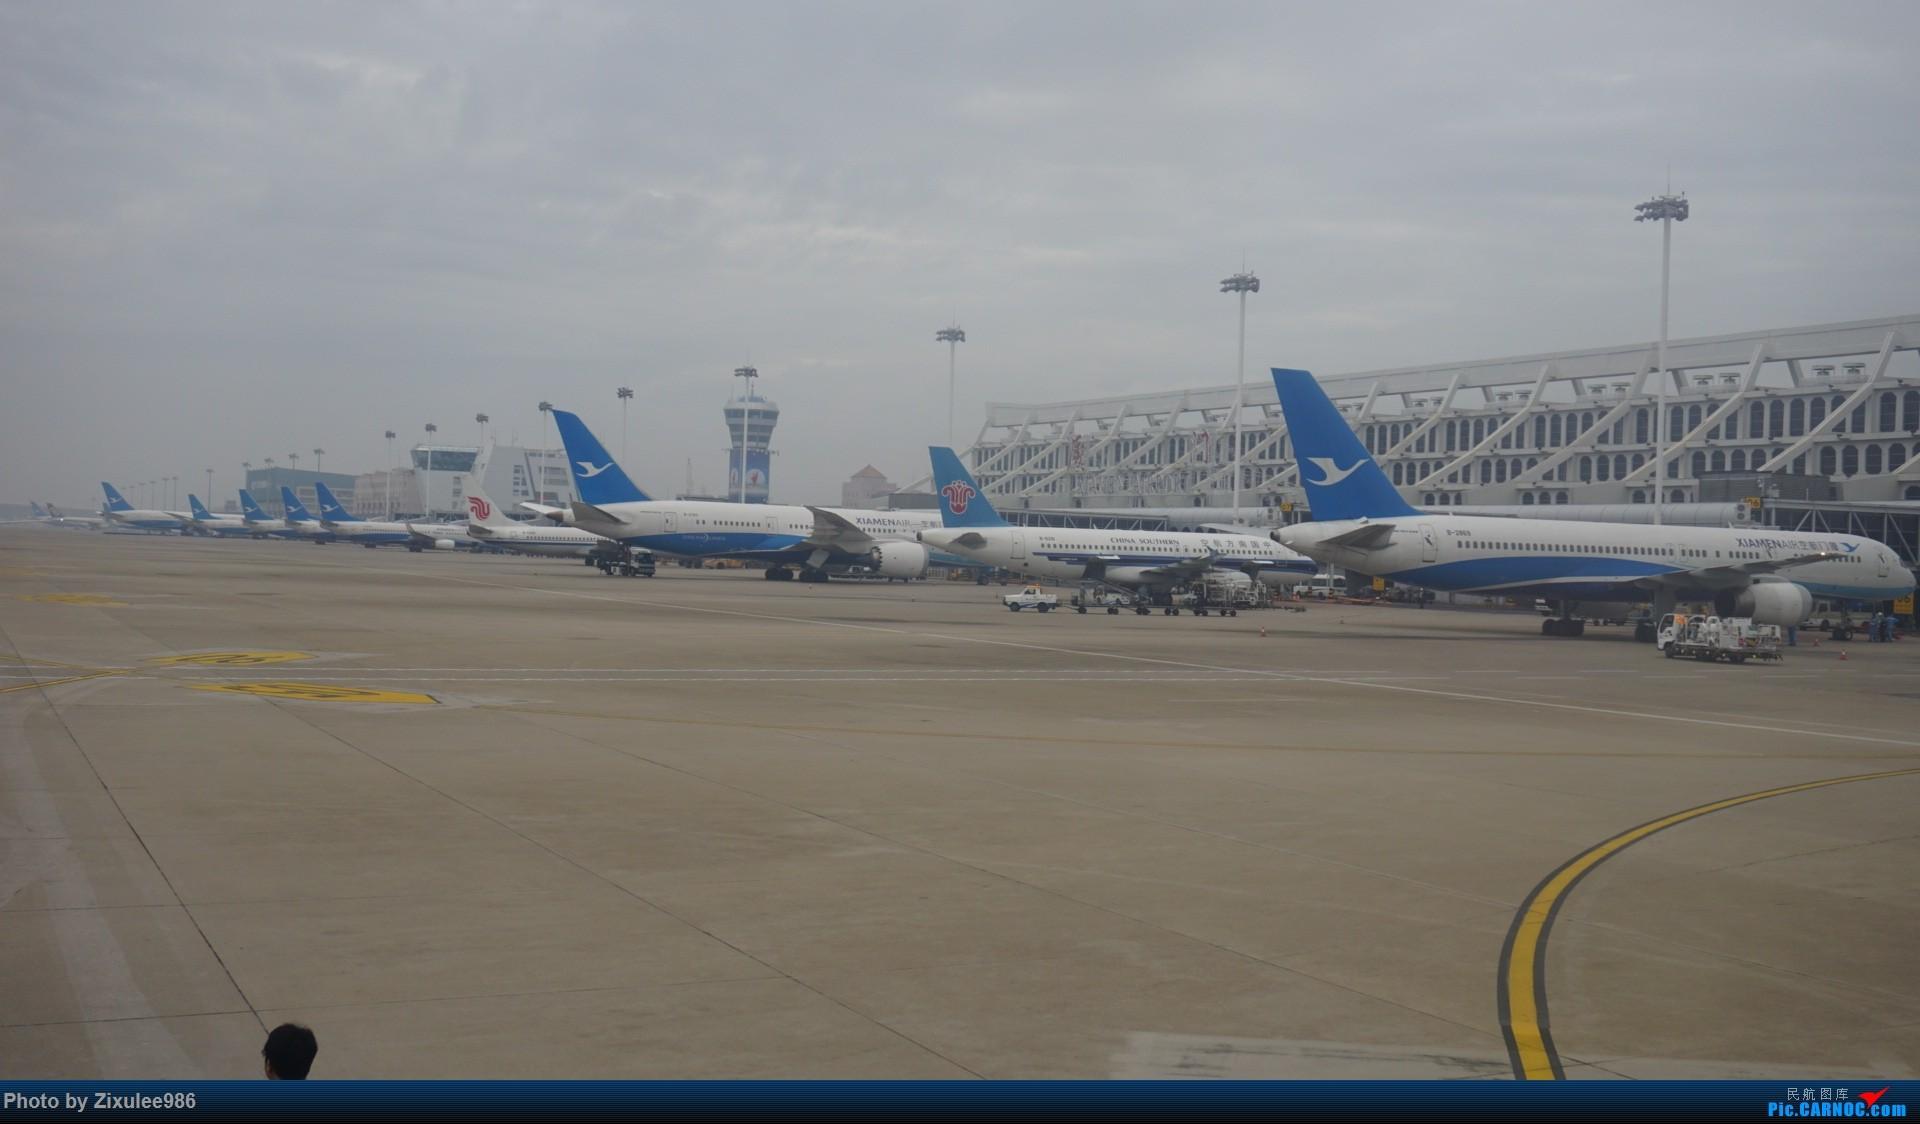 Re:[原创][XMN]寒假东北游随拍PART1--厦航篇~头一次拍752 BOEING 757-200 B-2869 中国厦门高崎国际机场 中国厦门高崎国际机场